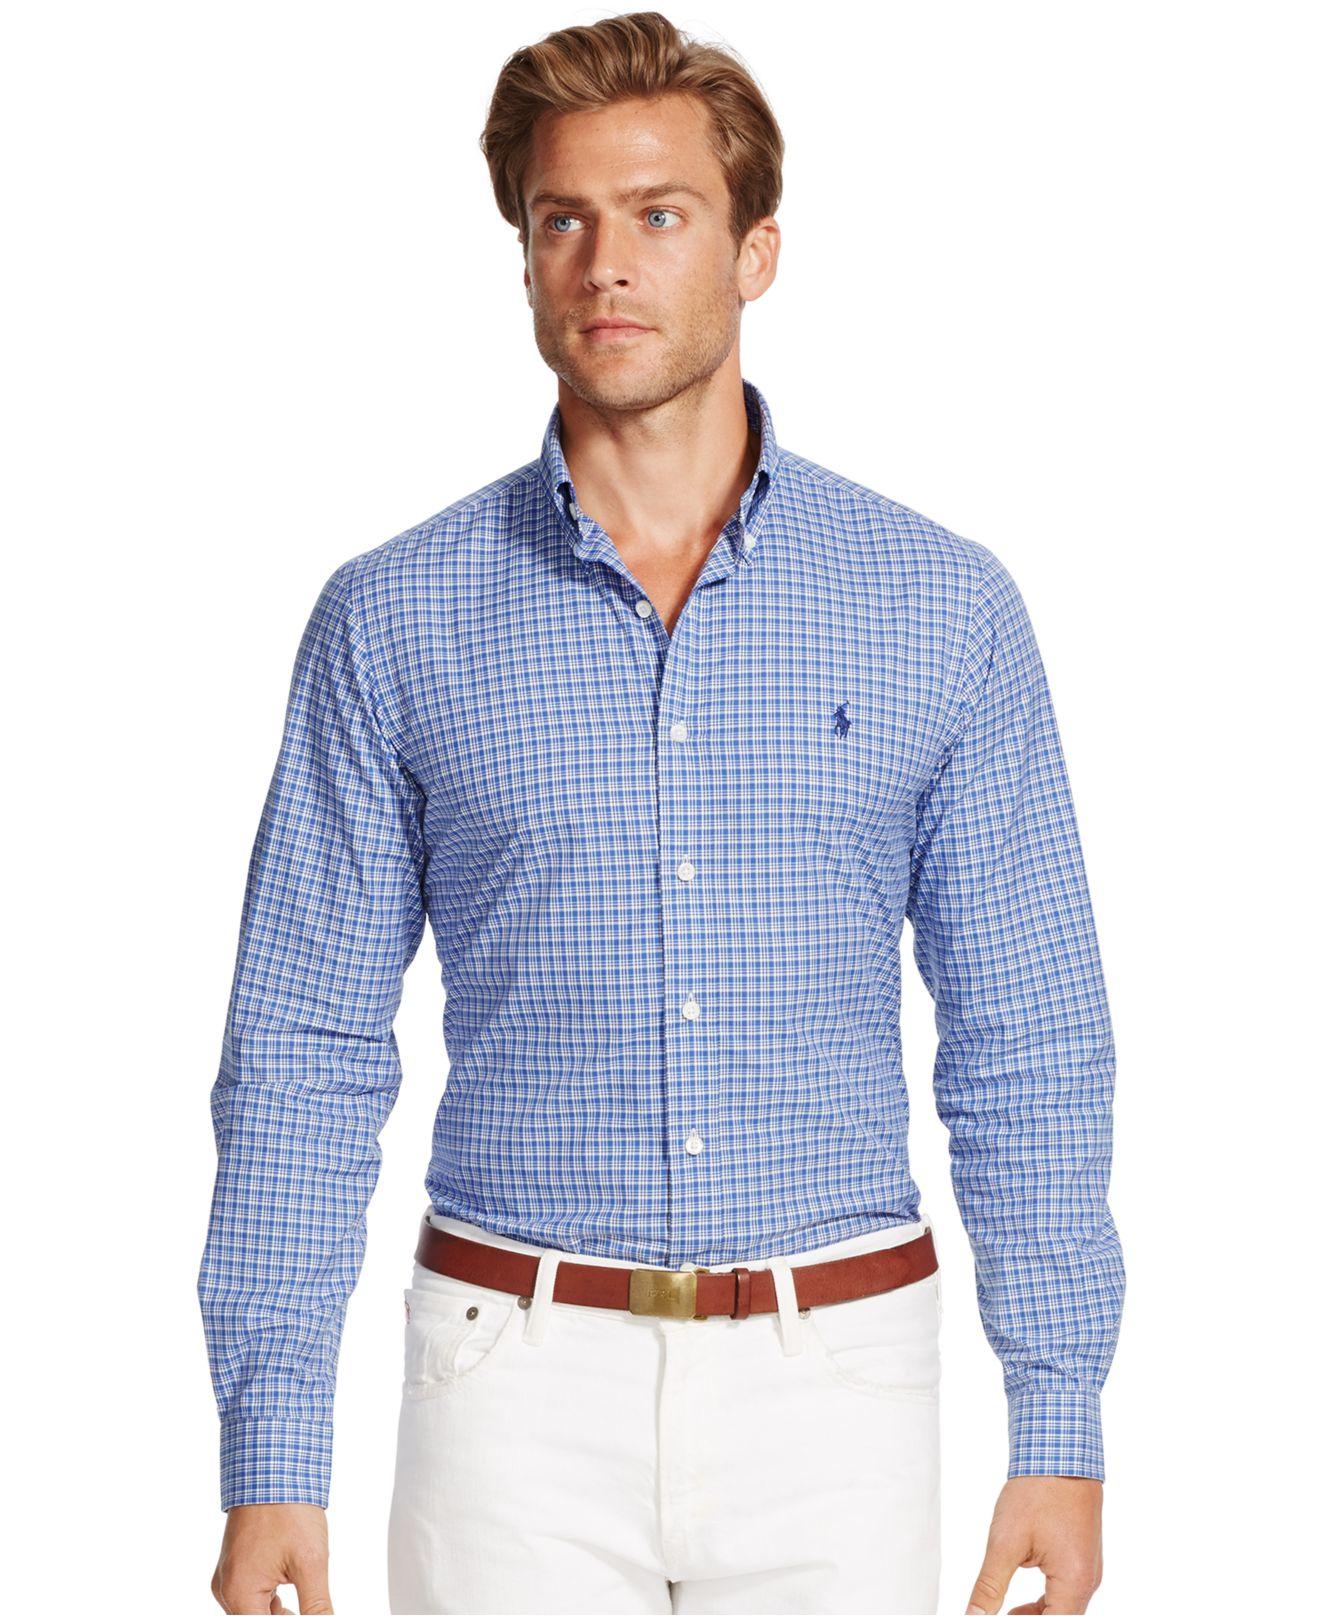 b11f06eb1be Lyst - Polo Ralph Lauren Checked Poplin Shirt in Blue for Men